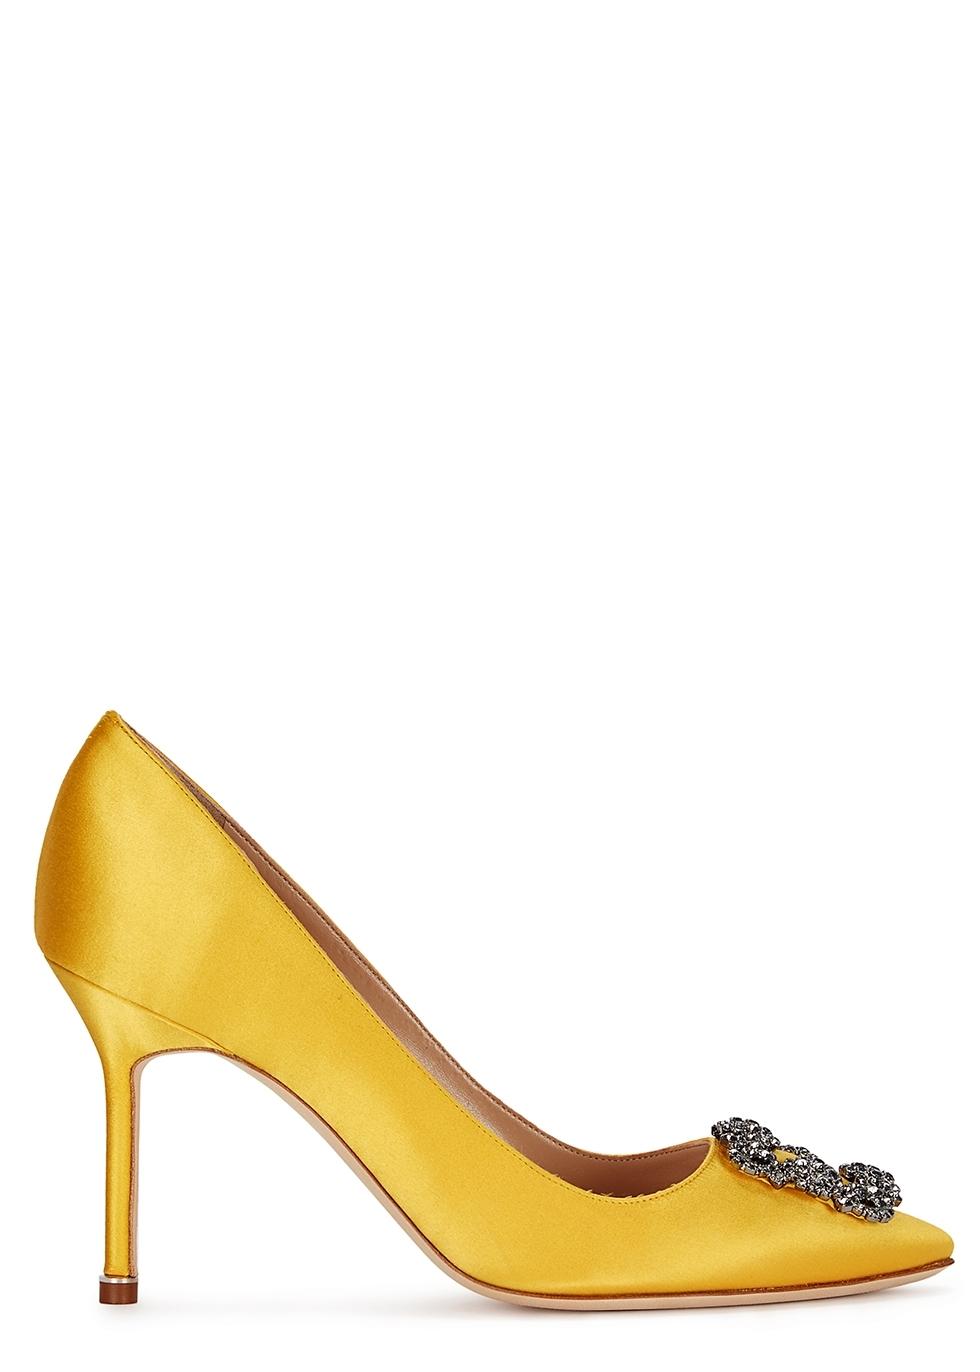 77b21bd314ec Manolo Blahnik Shoes